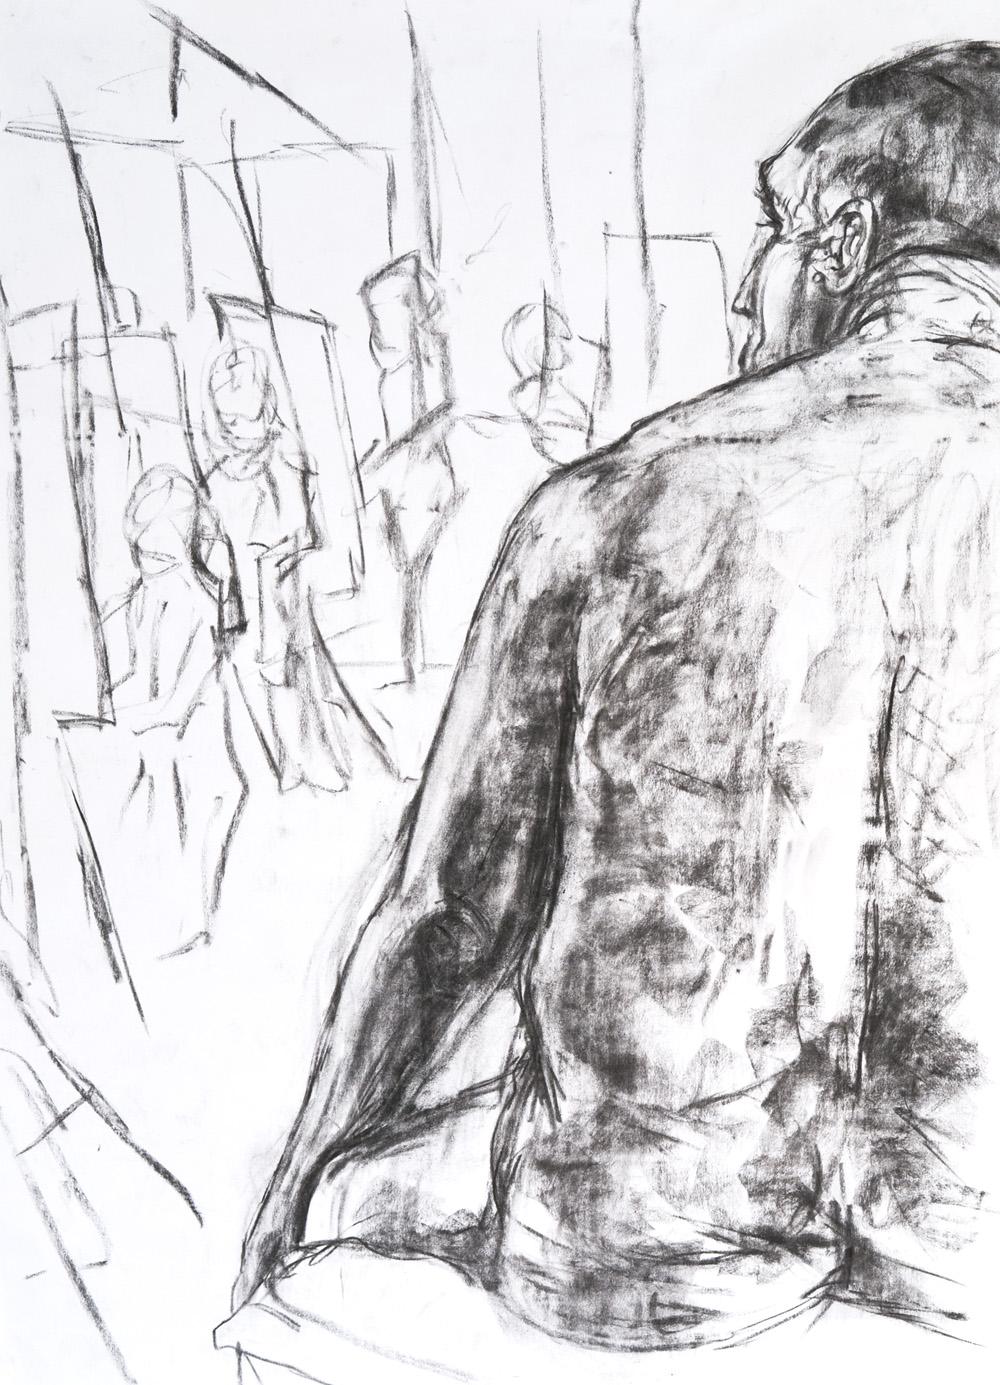 Life drawing 84x60cm 2008